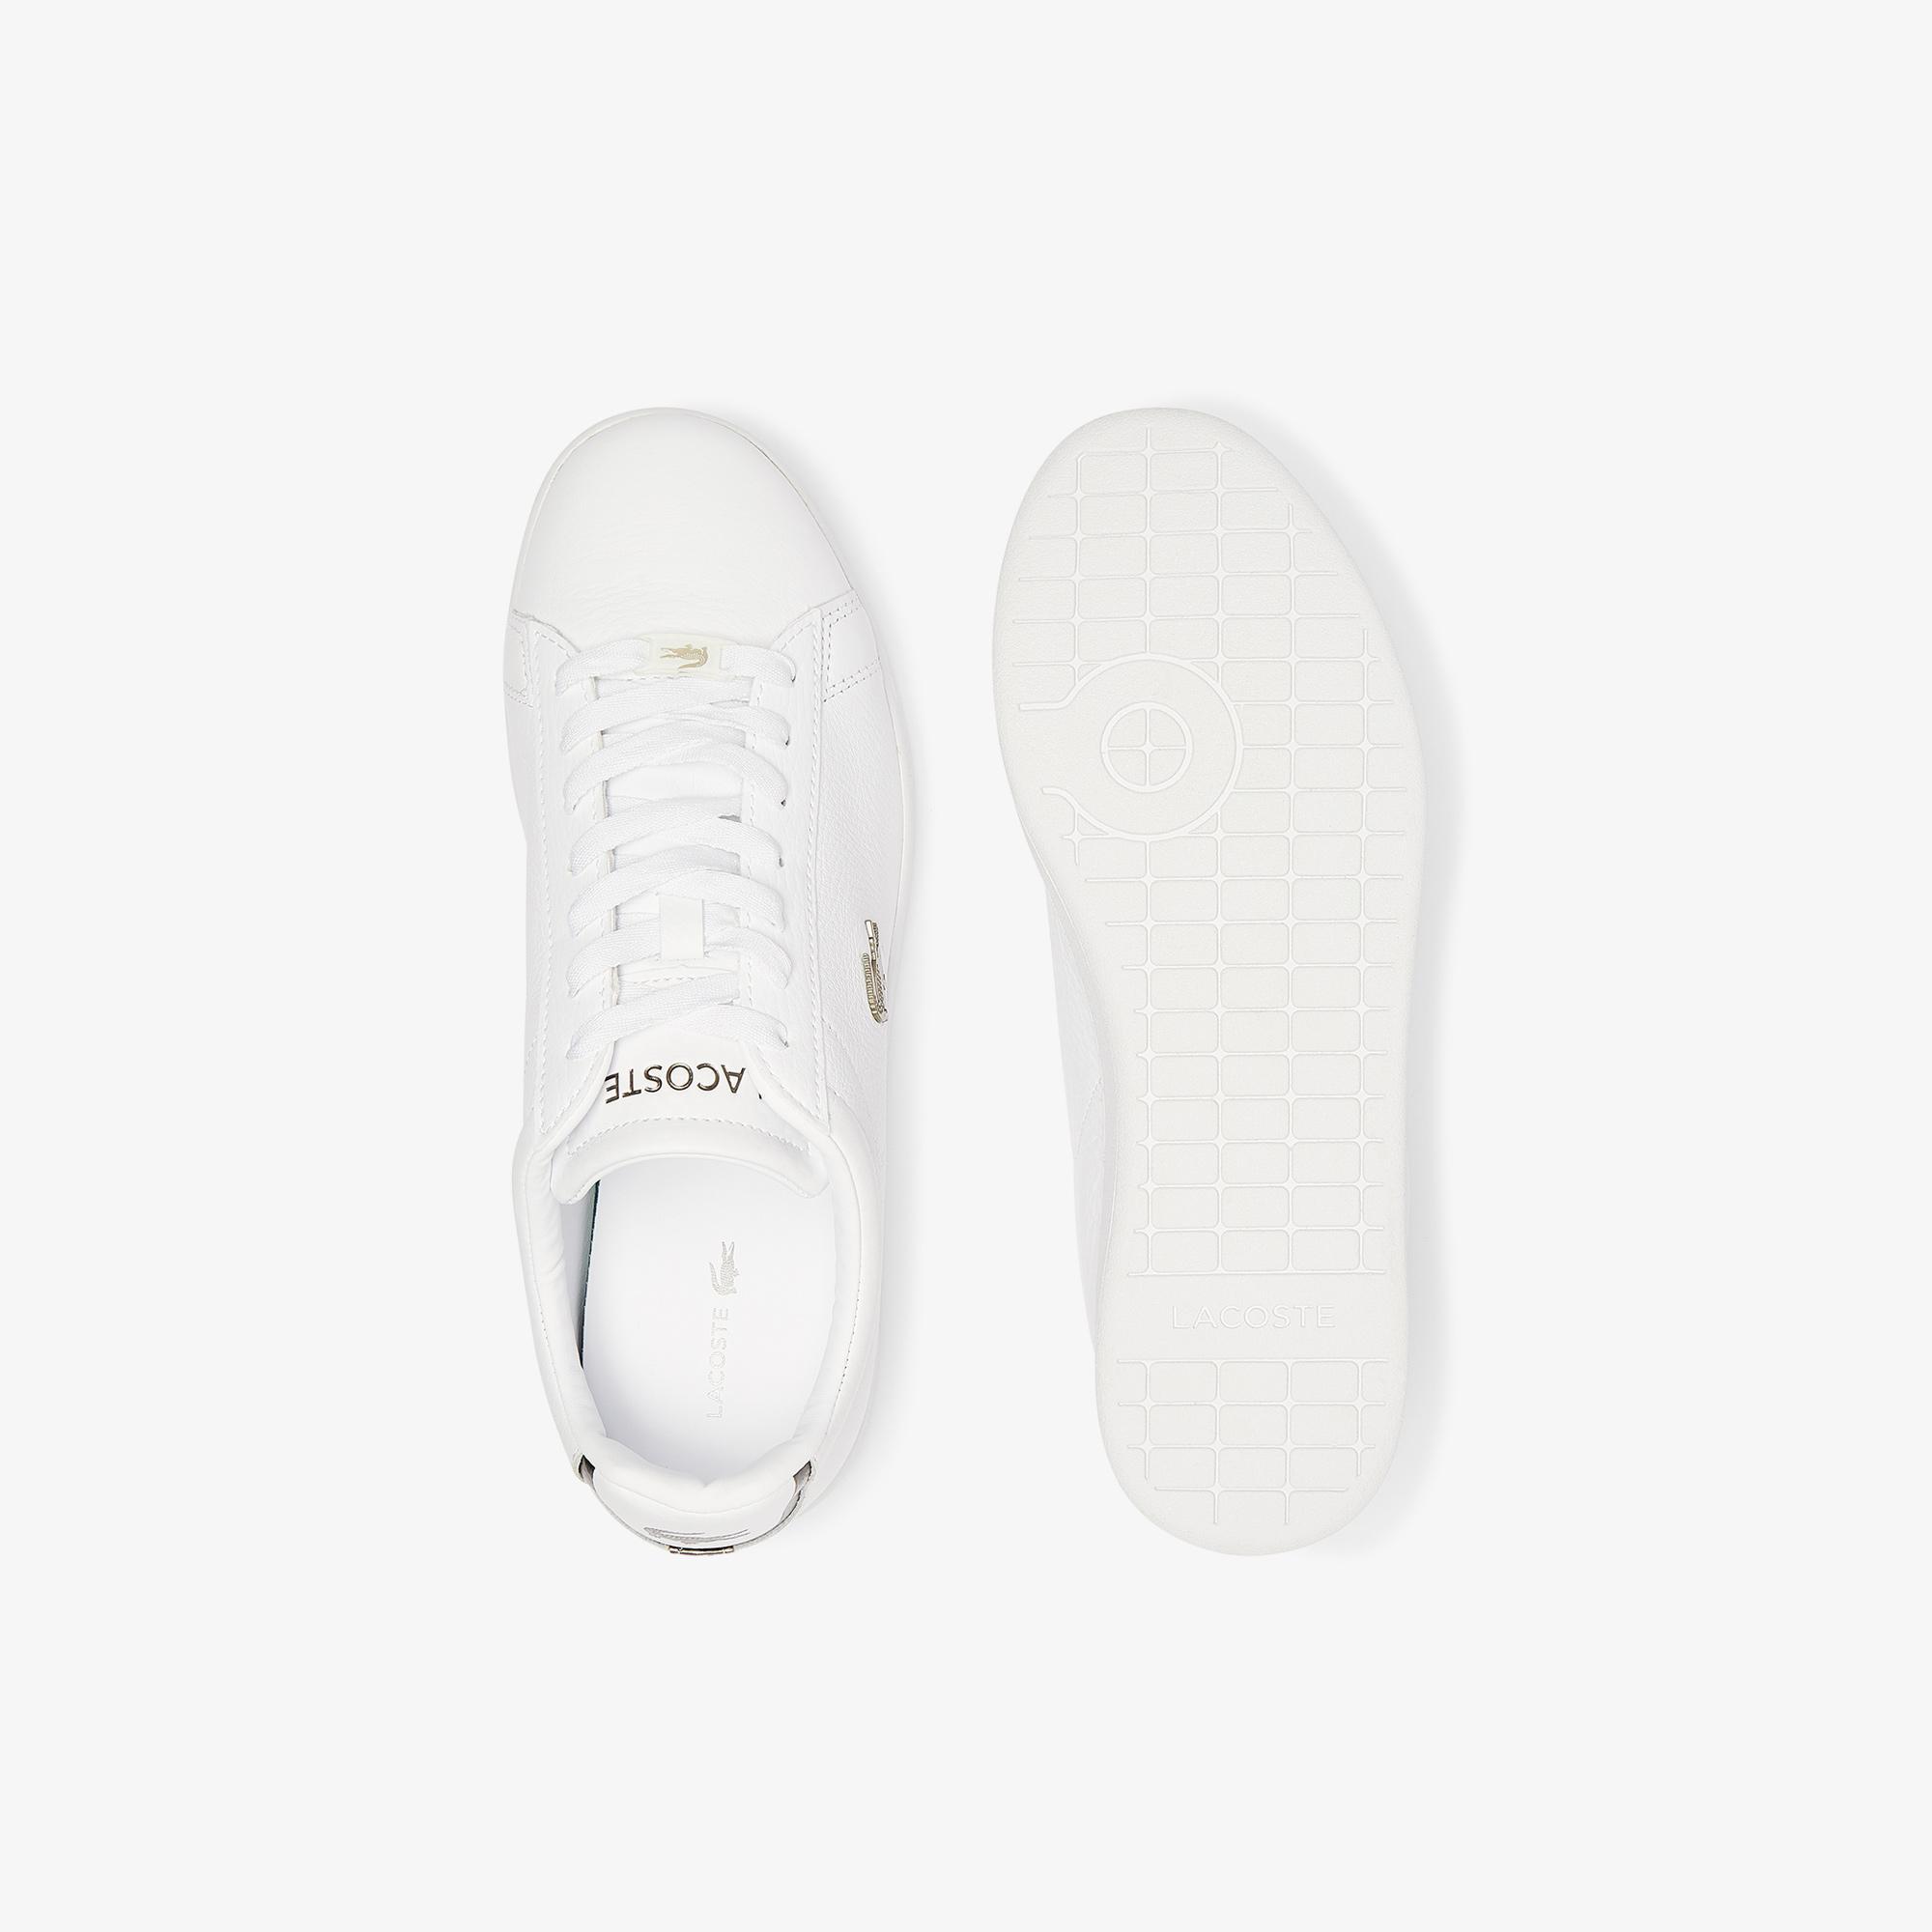 Lacoste Men'Scarnaby Evo 0721 3 Sma Shoes